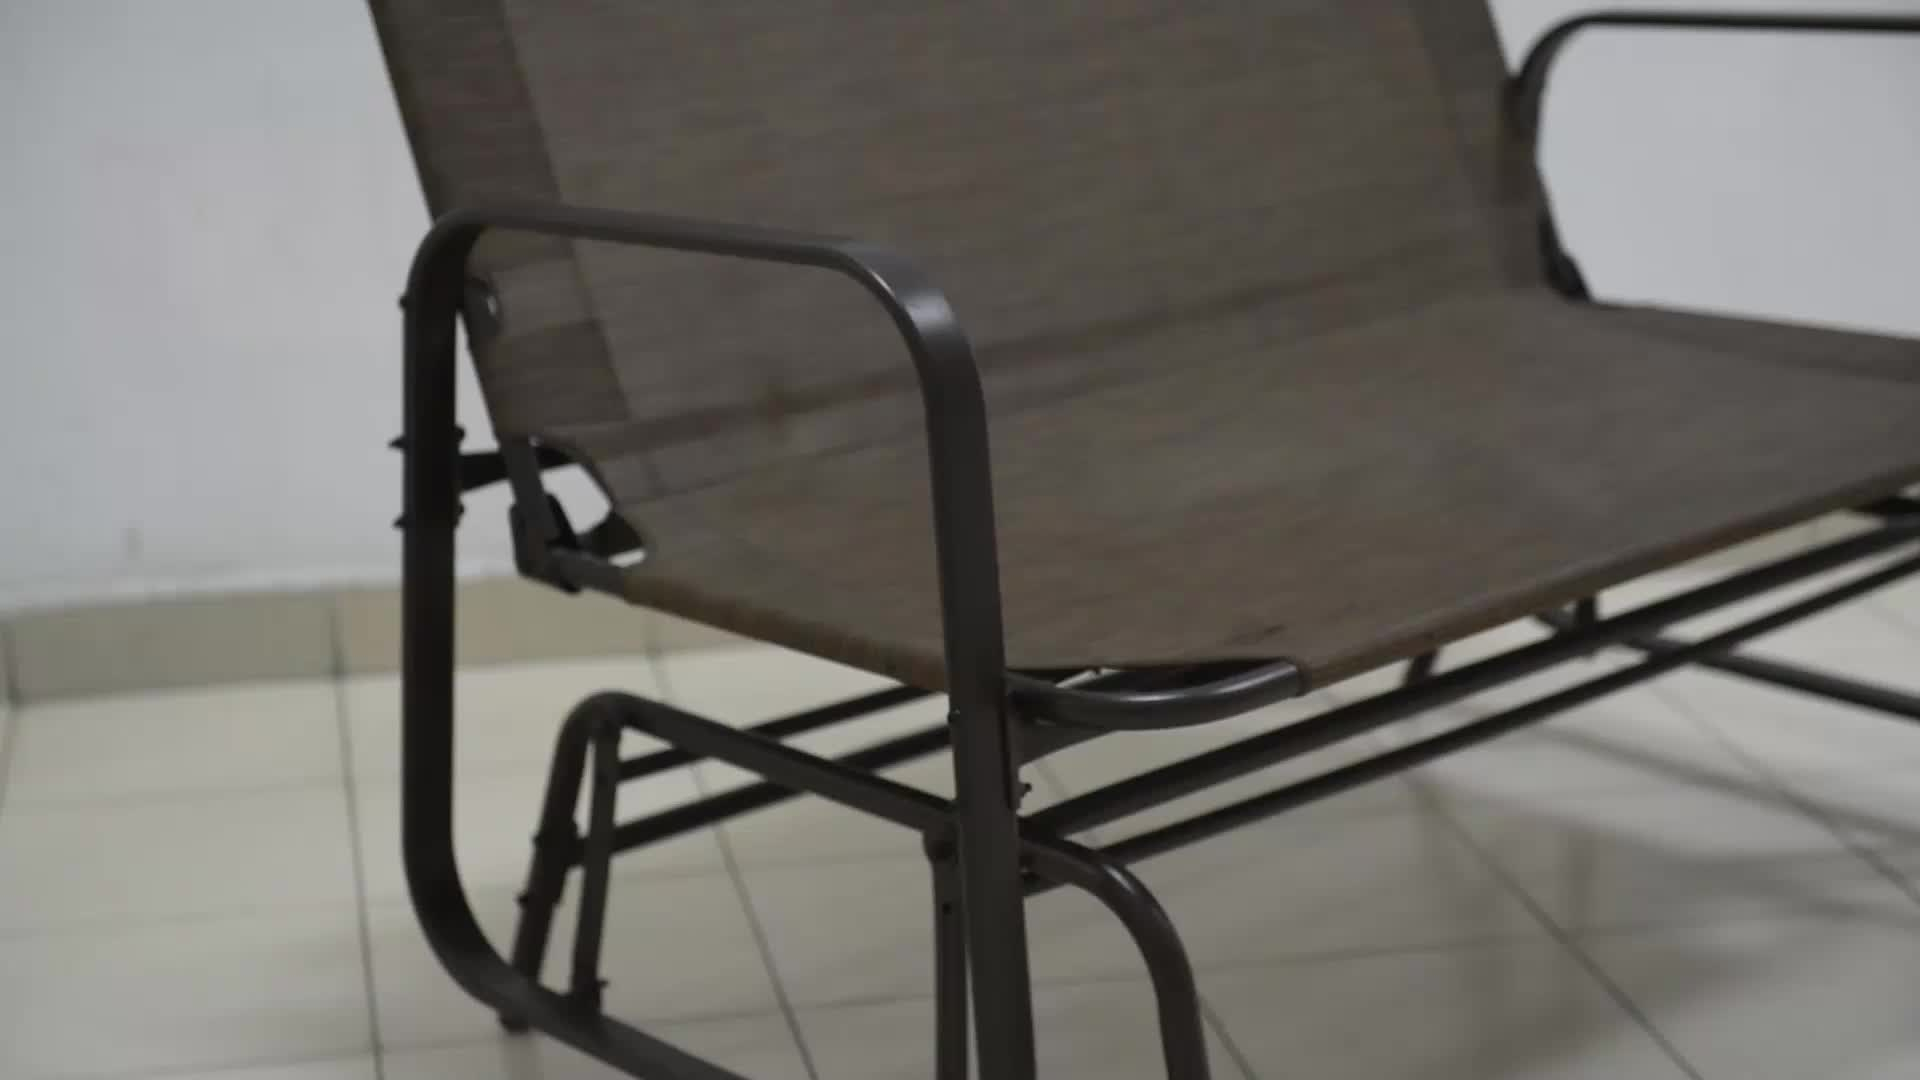 Outdoor Garden Steel Frame Patio Swing Glider Loveseat Bench Rocking Chair  – Buy Outdoor Garden Bench,metal Garden Bench,glider Rocking Chair Product Inside Black Outdoor Durable Steel Frame Patio Swing Glider Bench Chairs (Photo 11 of 25)